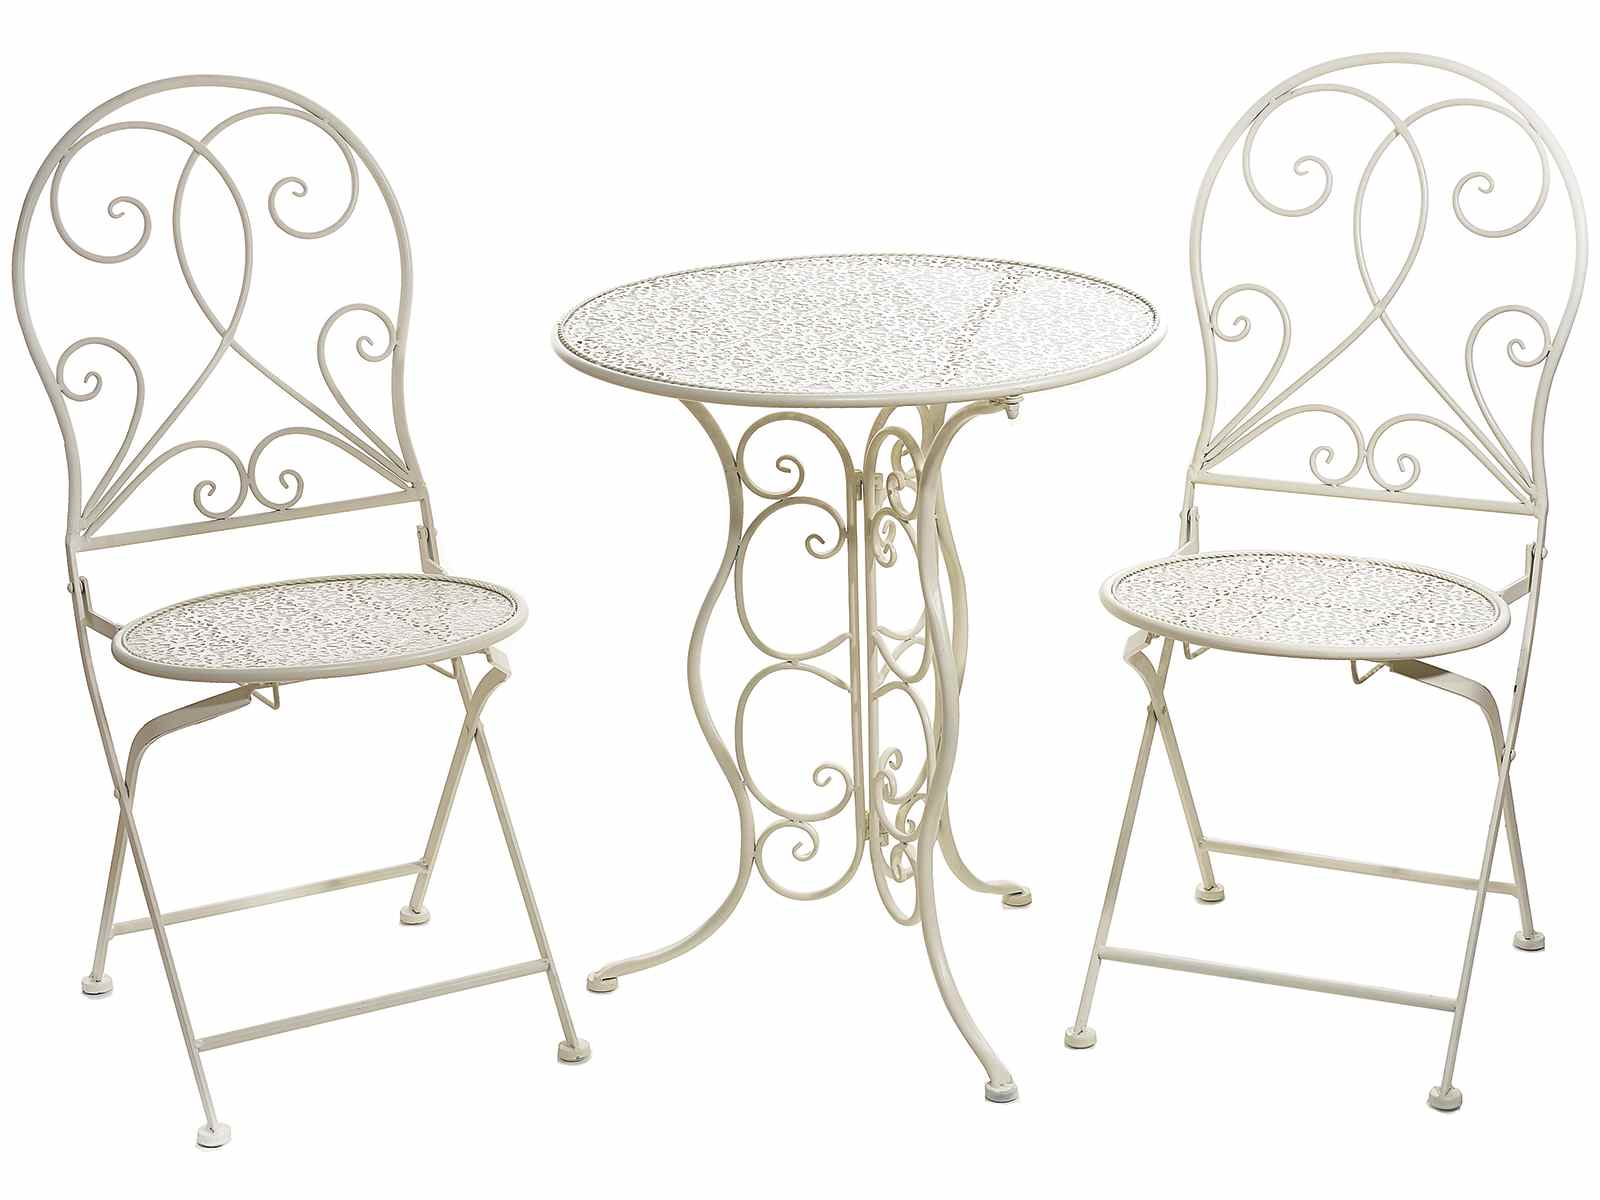 Sedie Da Giardino In Metallo.Set Tavolo E 2 Sedie Da Giardino In Metallo Traforato 53 20 50